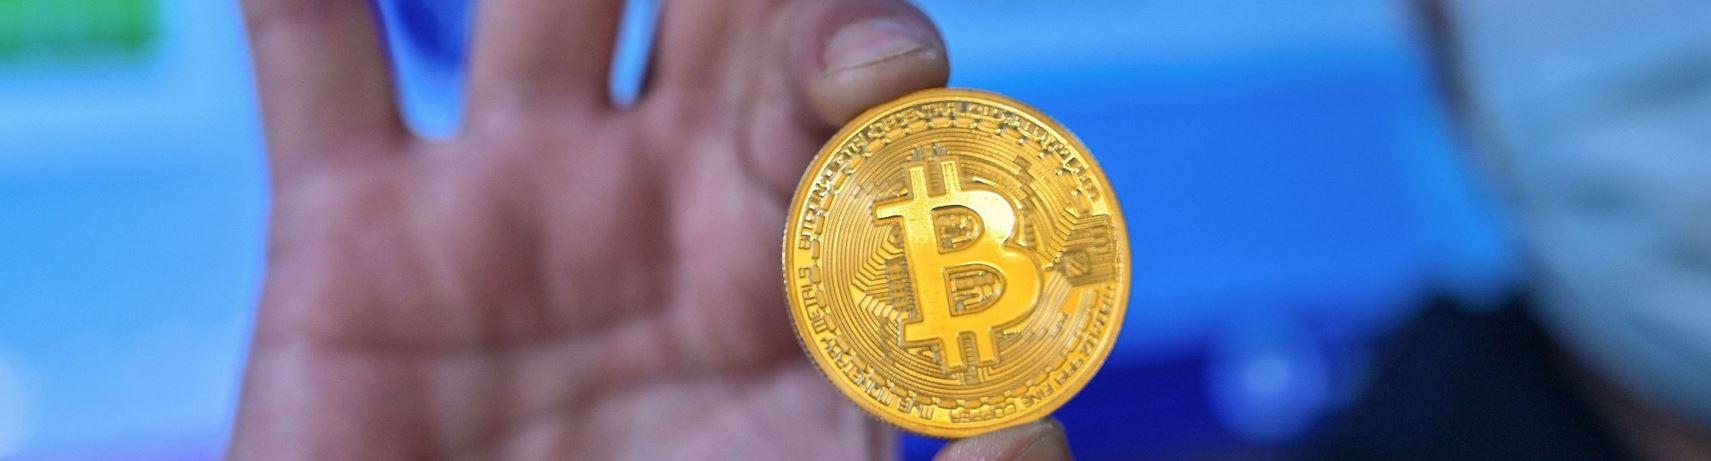 Hvordan få gratis Bitcoin